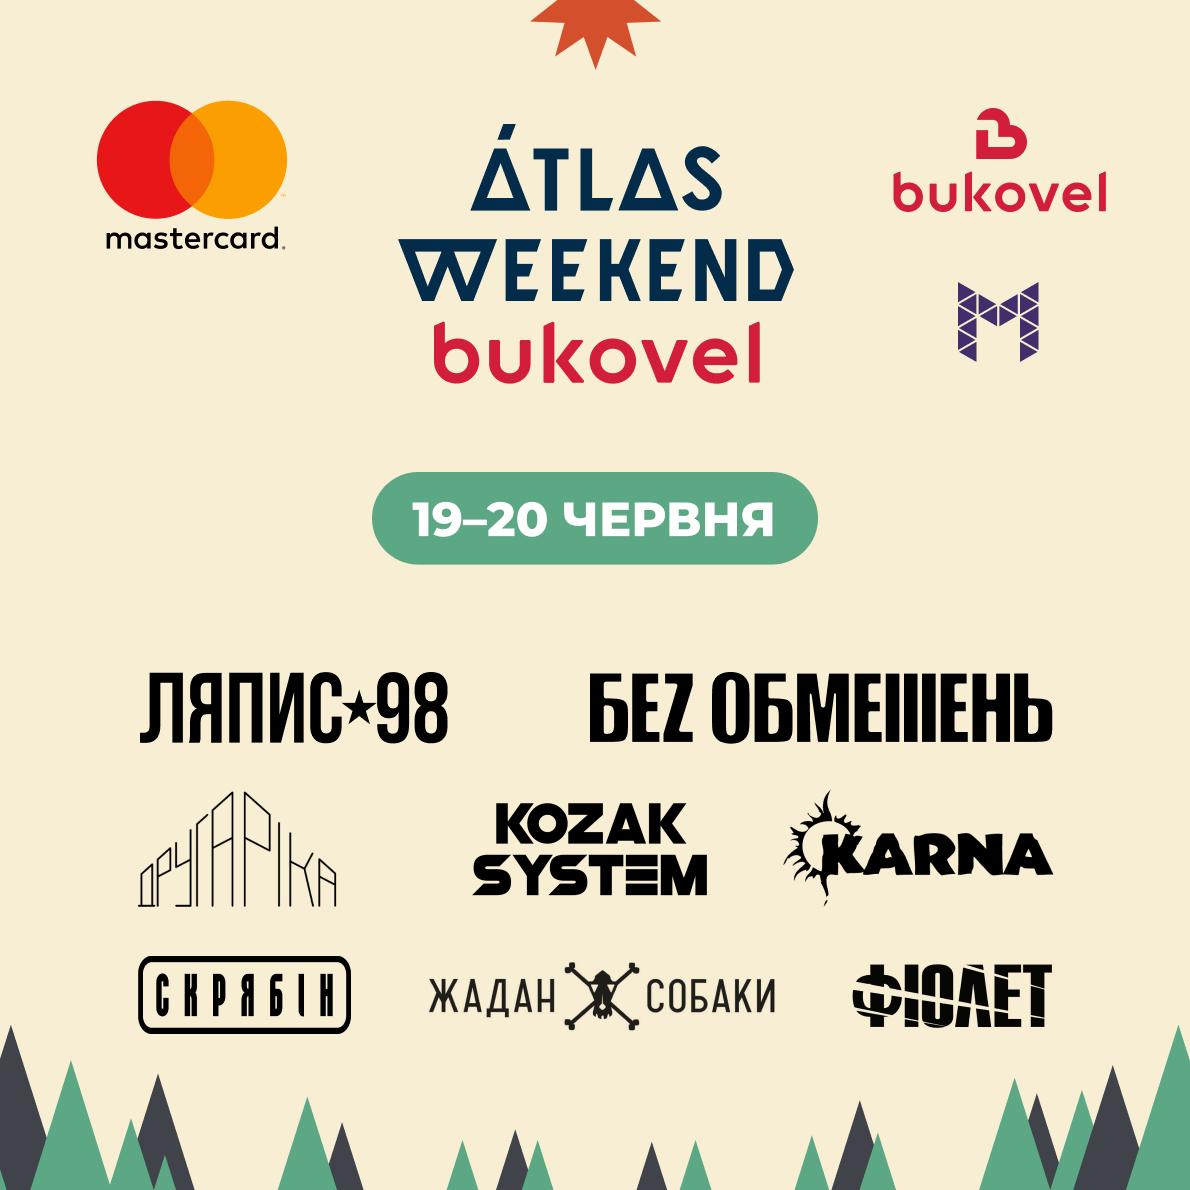 Atlas Weekend Bukovel 2021 програма учасники